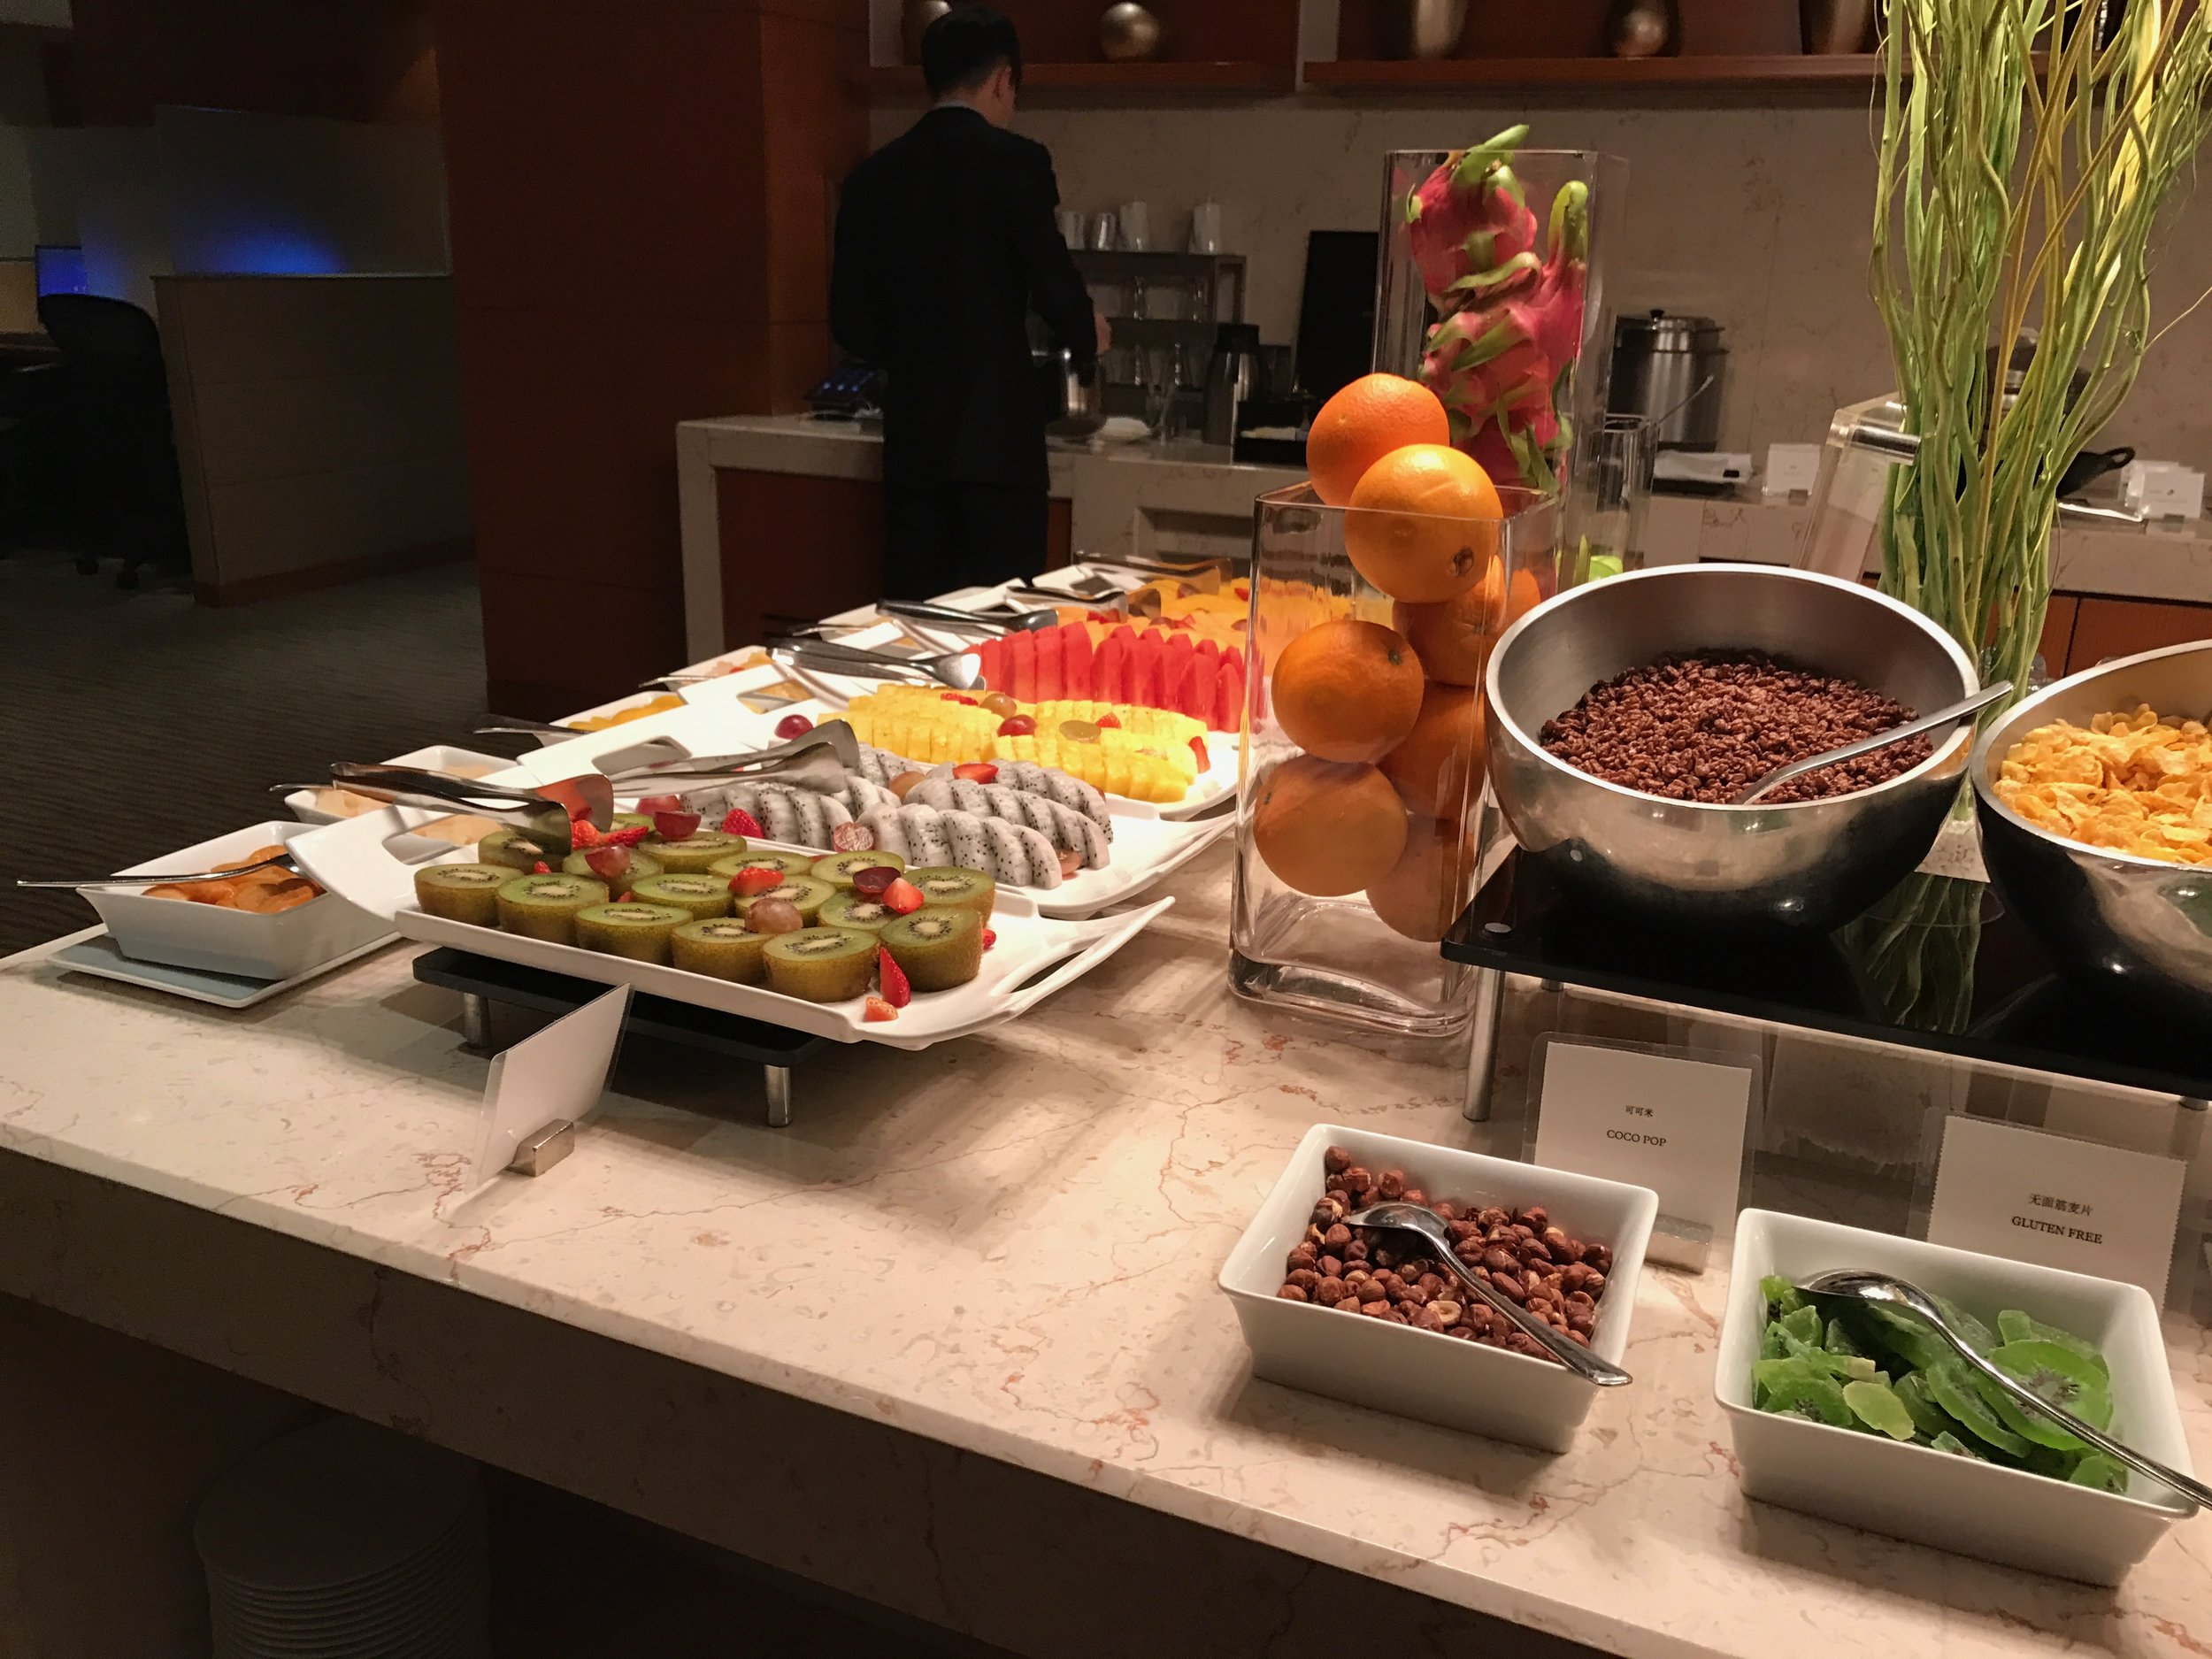 Executive Renewal Suite - Club lounge breakfast service